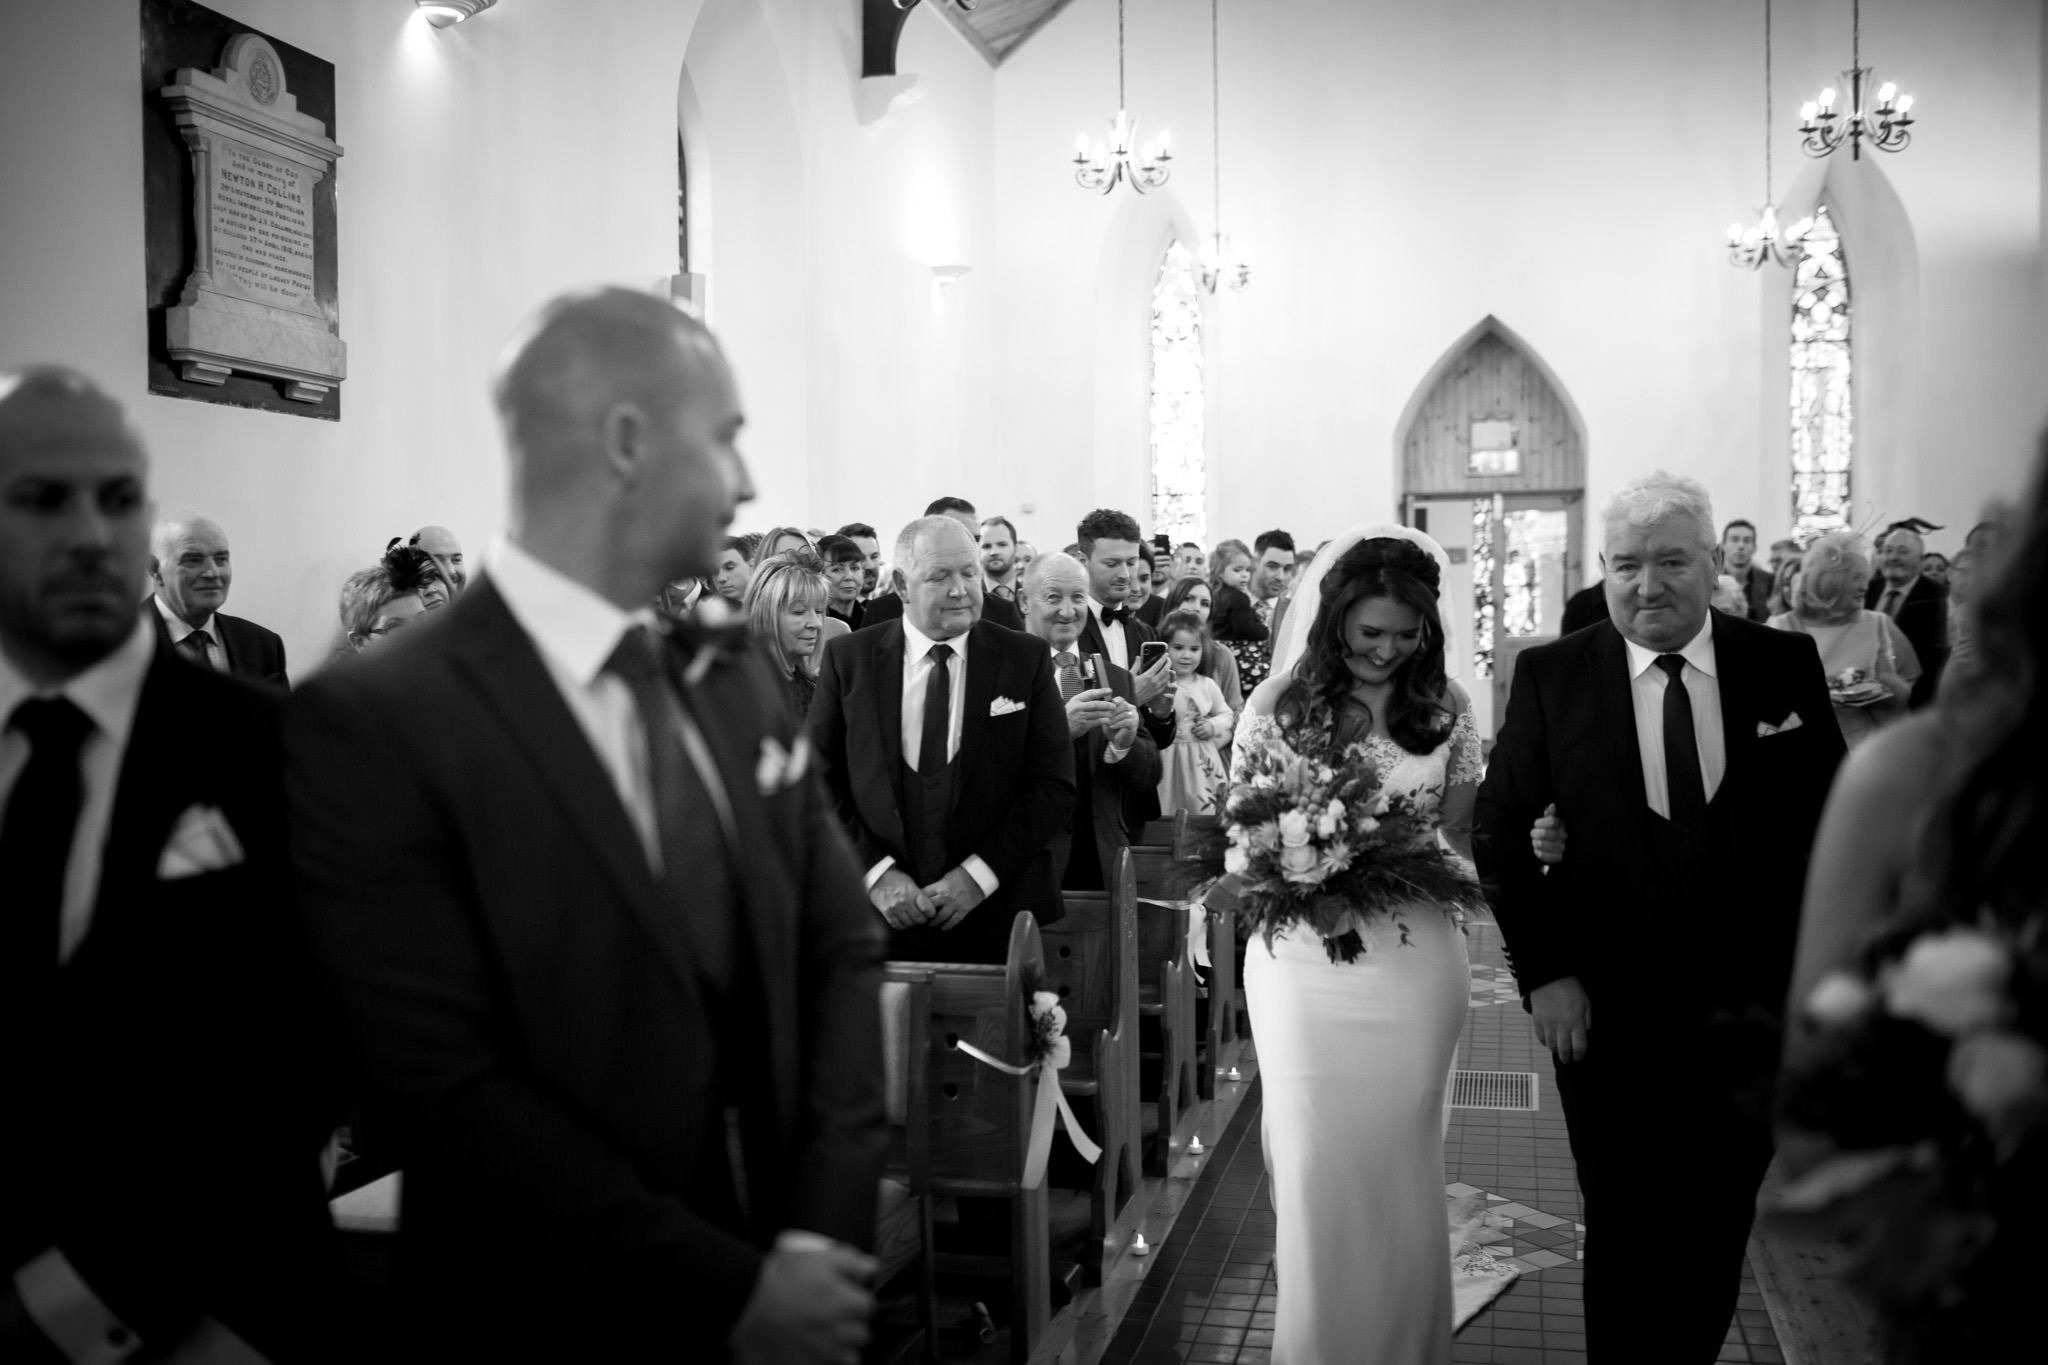 Mark_Barnes_Northern_Ireland_wedding_photographer_Harveys_Point_Donegall_Wedding_photography-Adam&Gemma-16.jpg